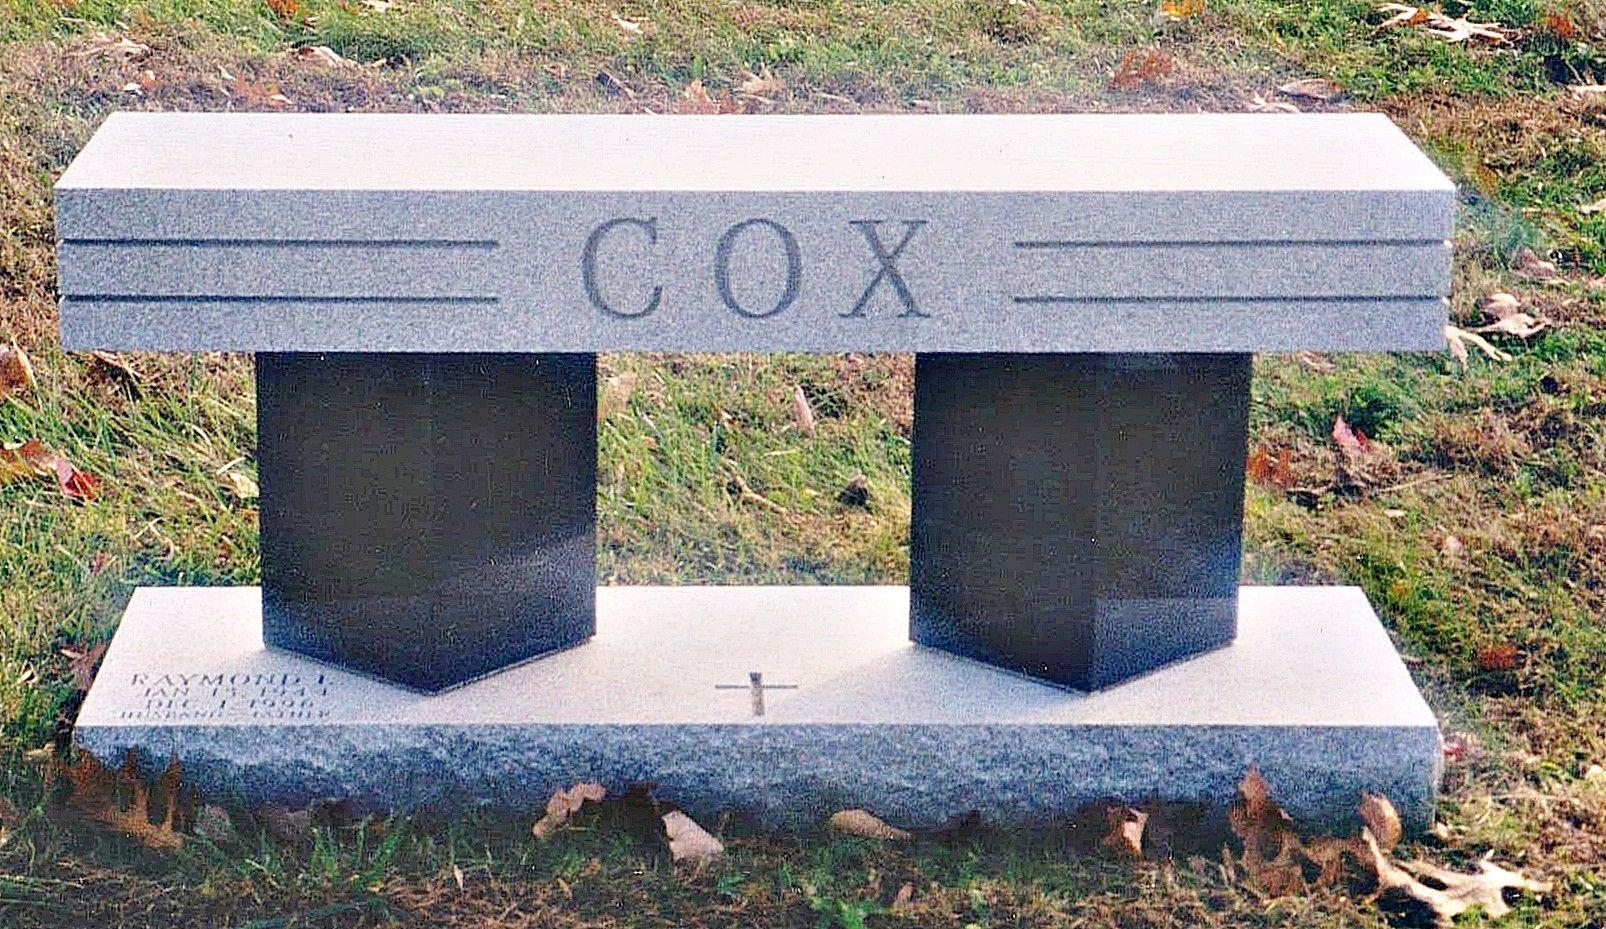 Crone Memorials Headstones Memorial Benches Memorial Keepsakes